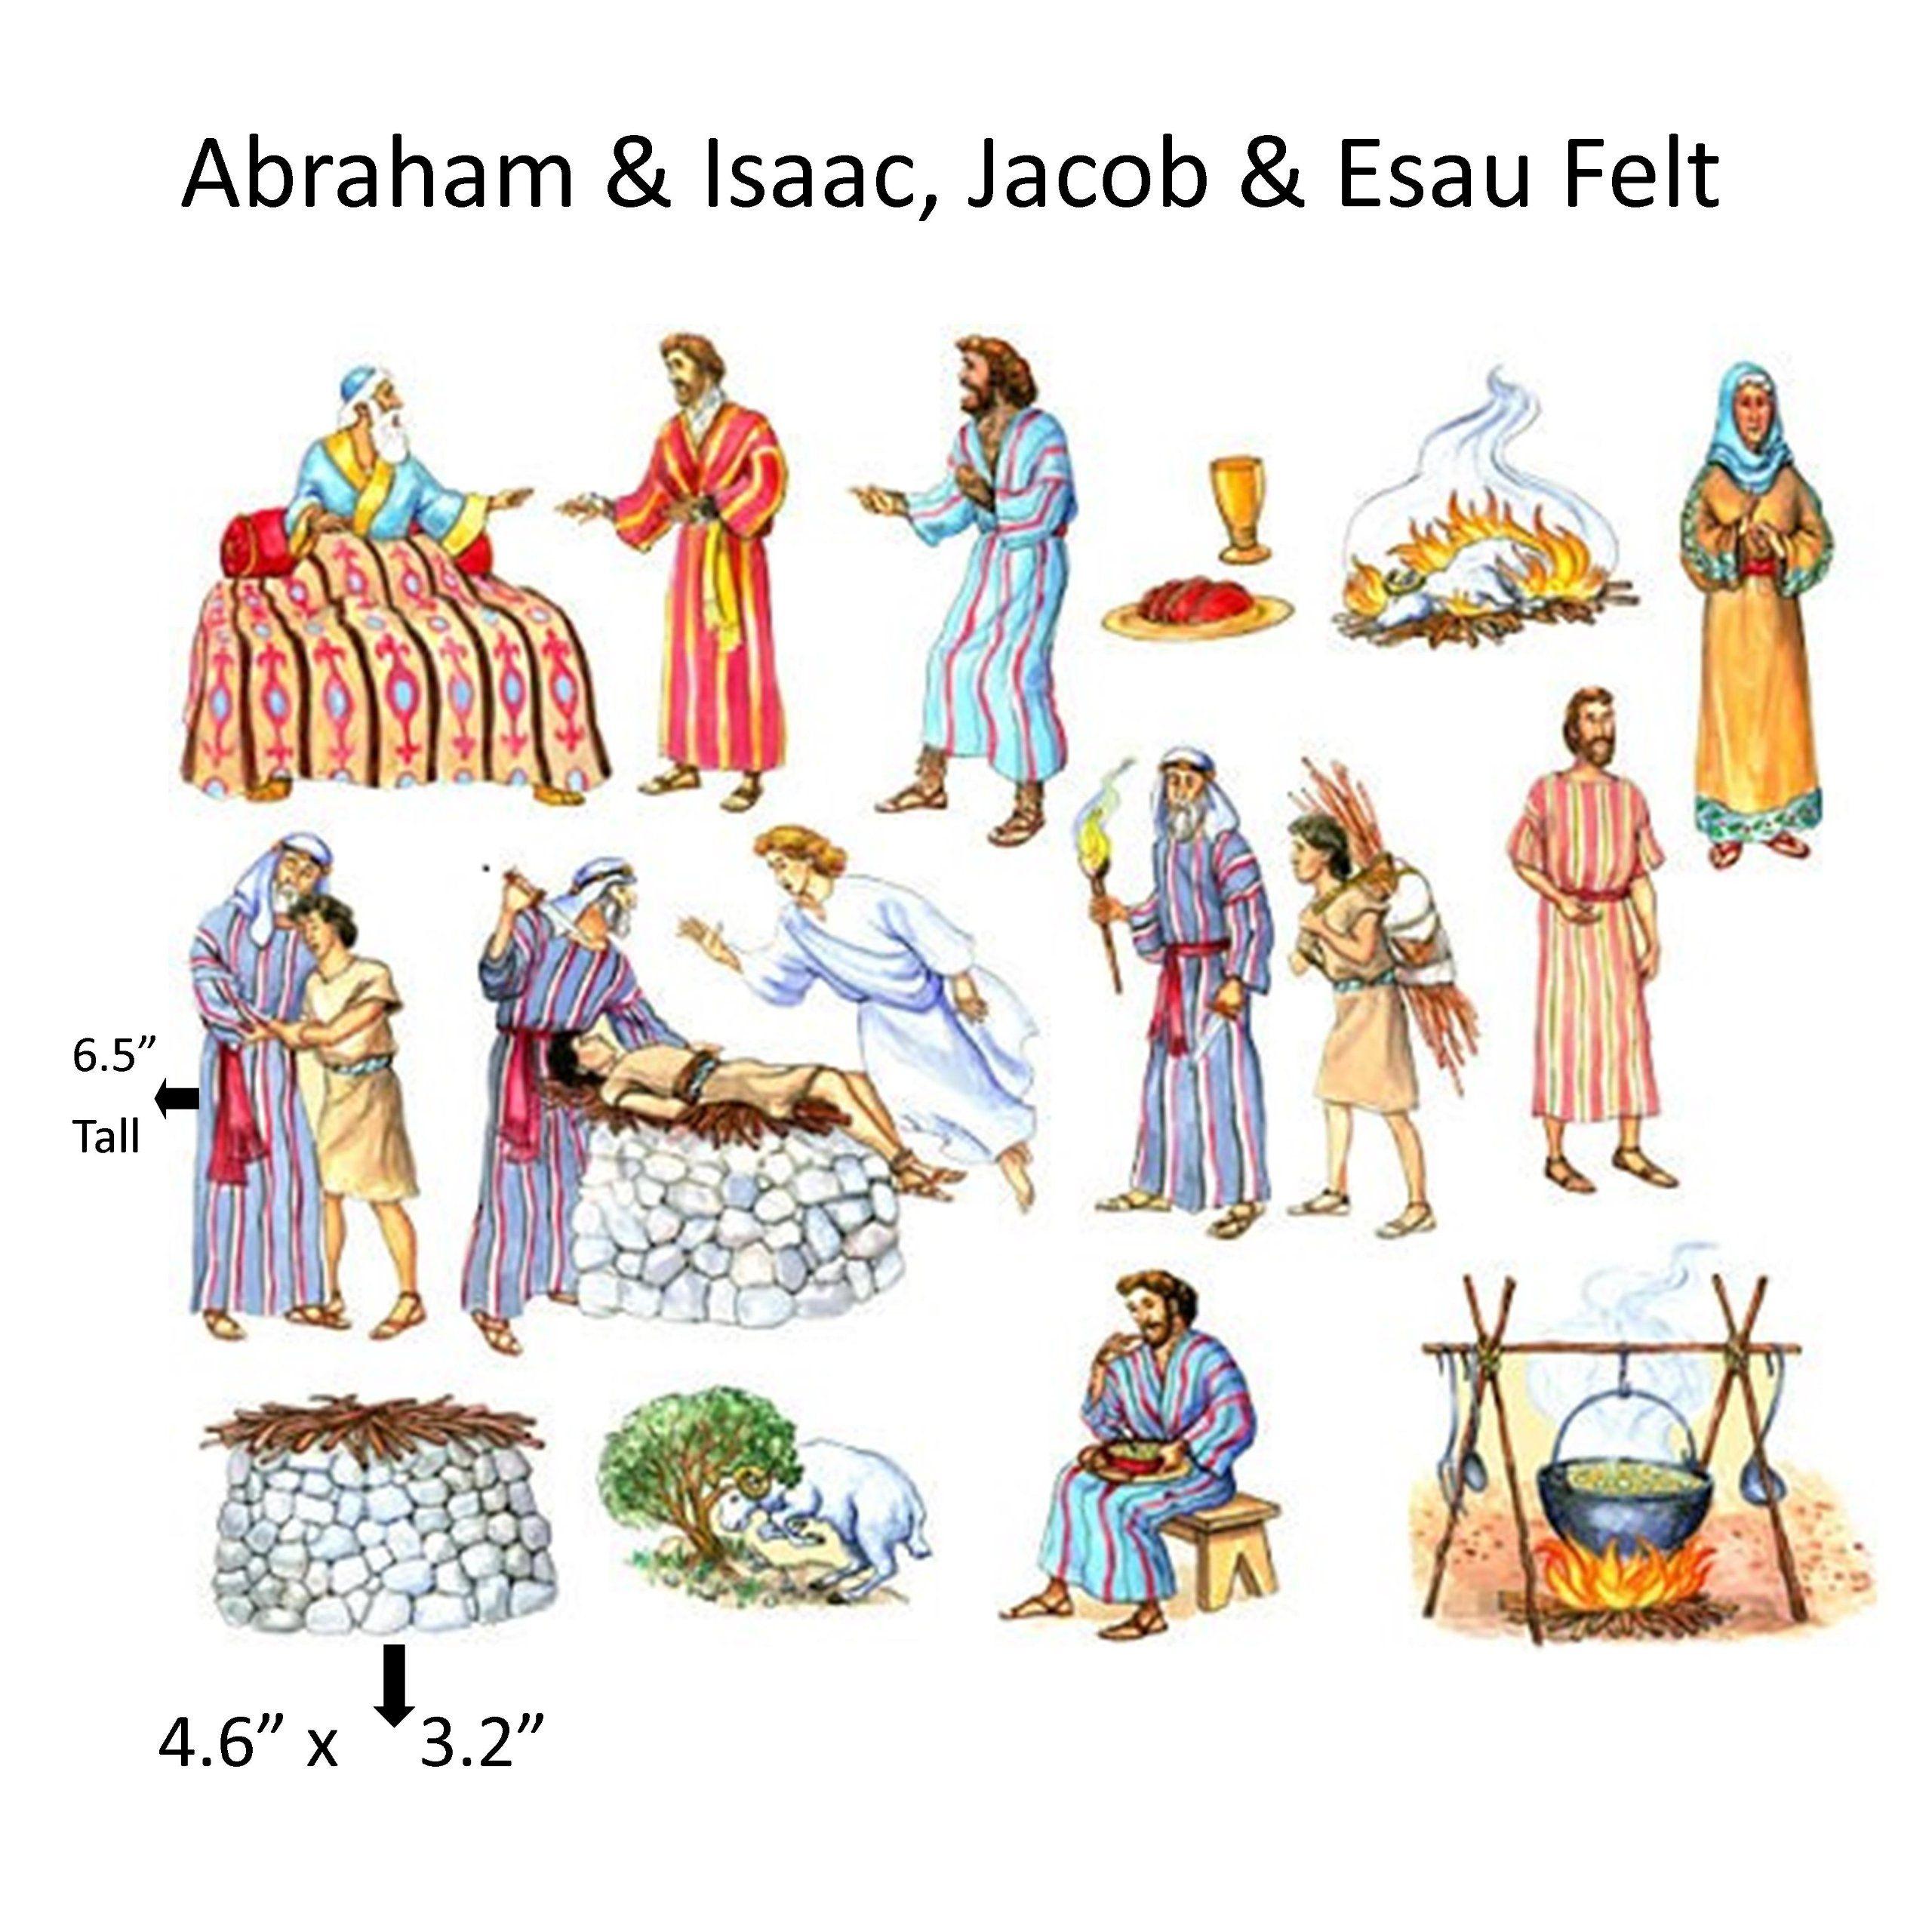 Abraham Amp Isaac Felt Figures For Flannel Board Bible Stories Precut